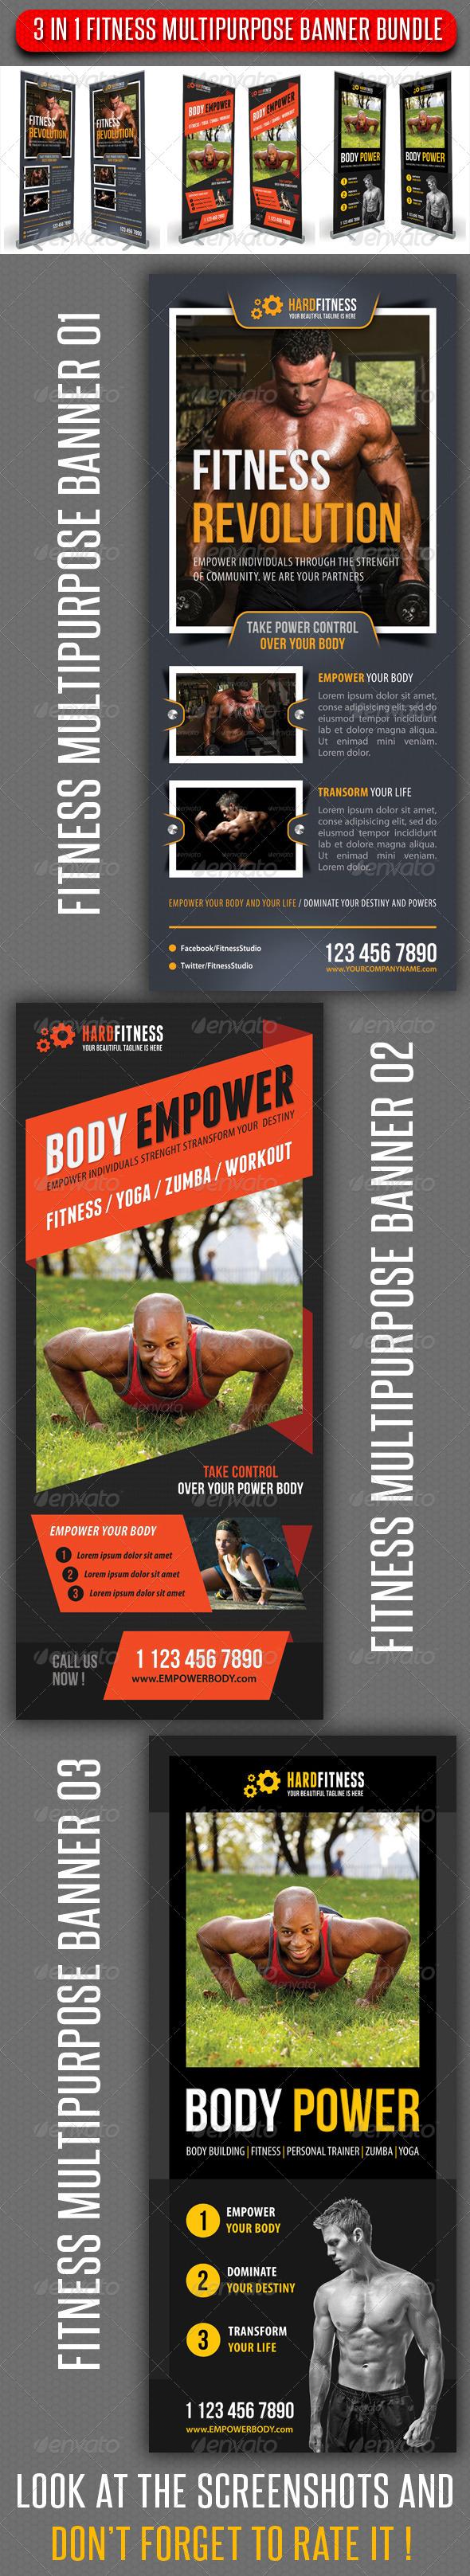 GraphicRiver 3 in 1 Fitness Multipurpose Banner Bundle 03 8039232